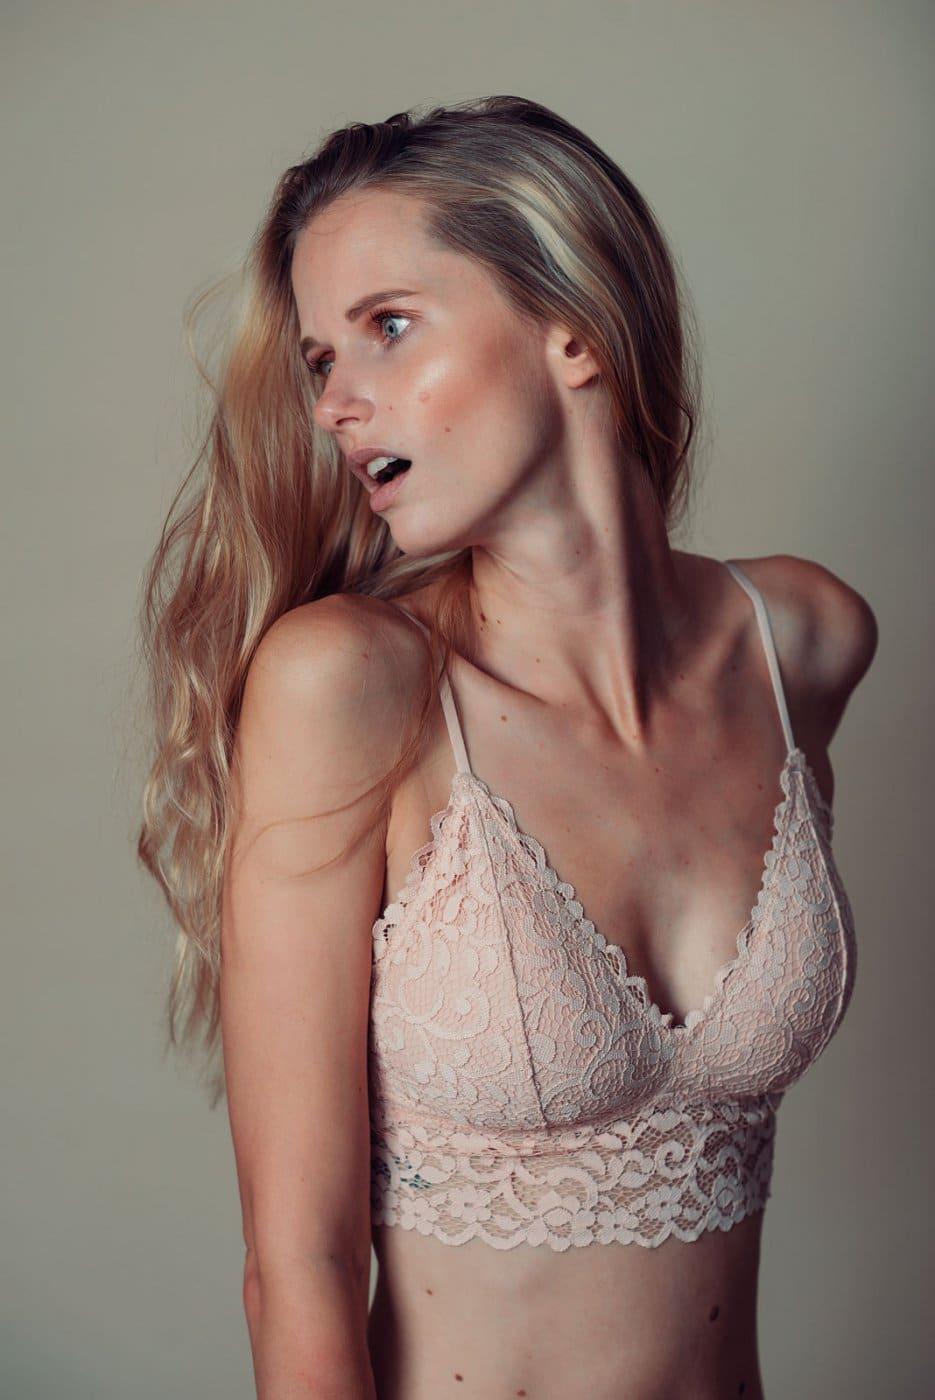 Portrait Studio Photography By Anastasia Vervueren Lingerie Beauty